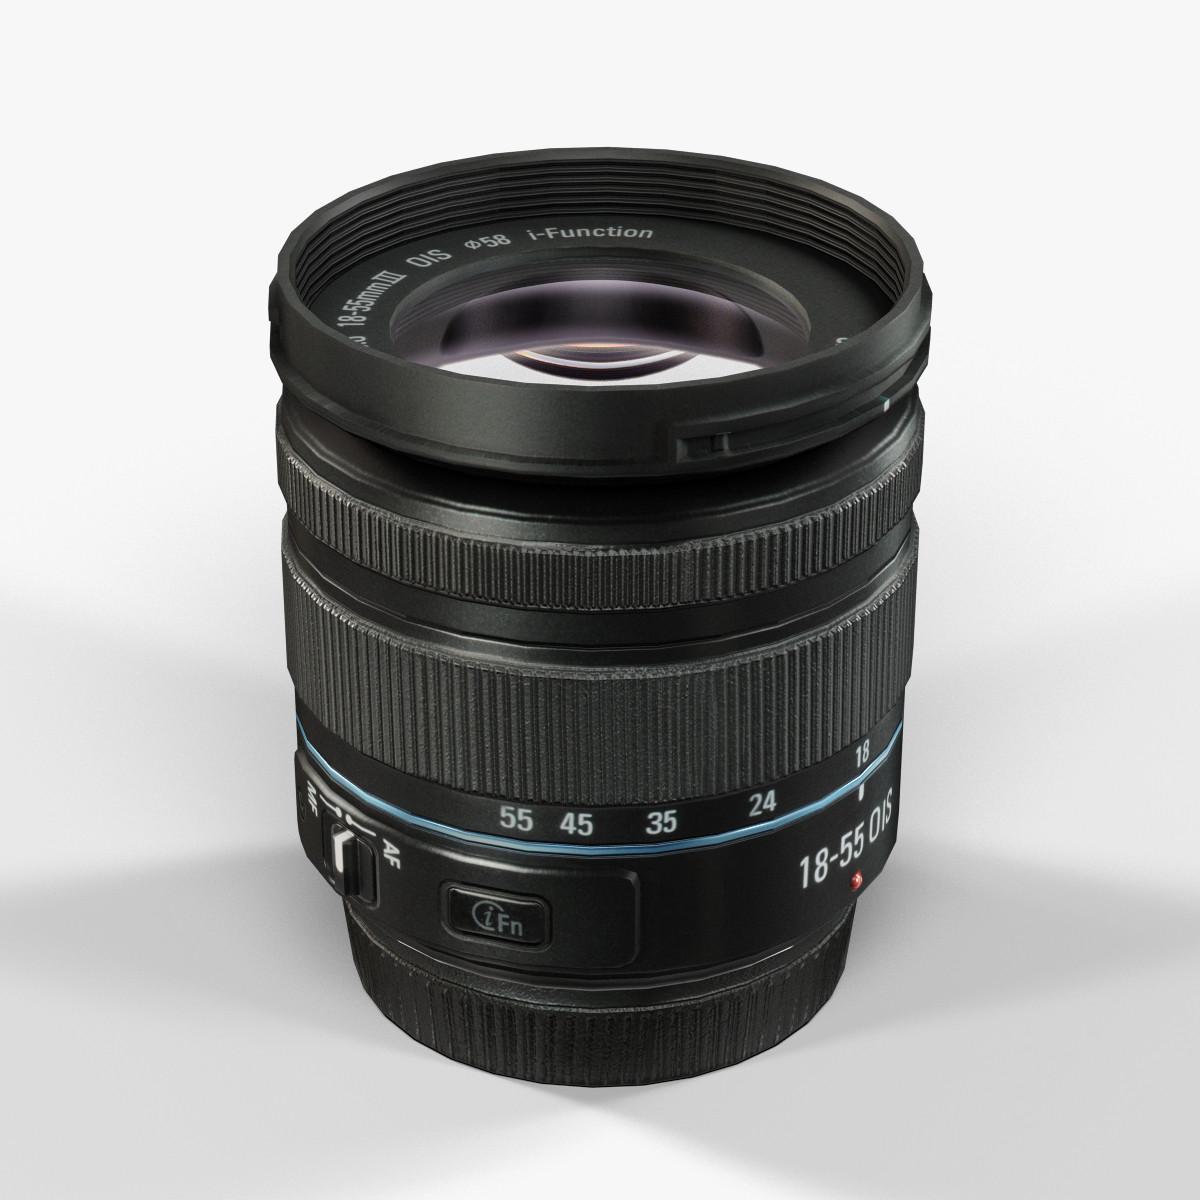 Samsung 18-55mm